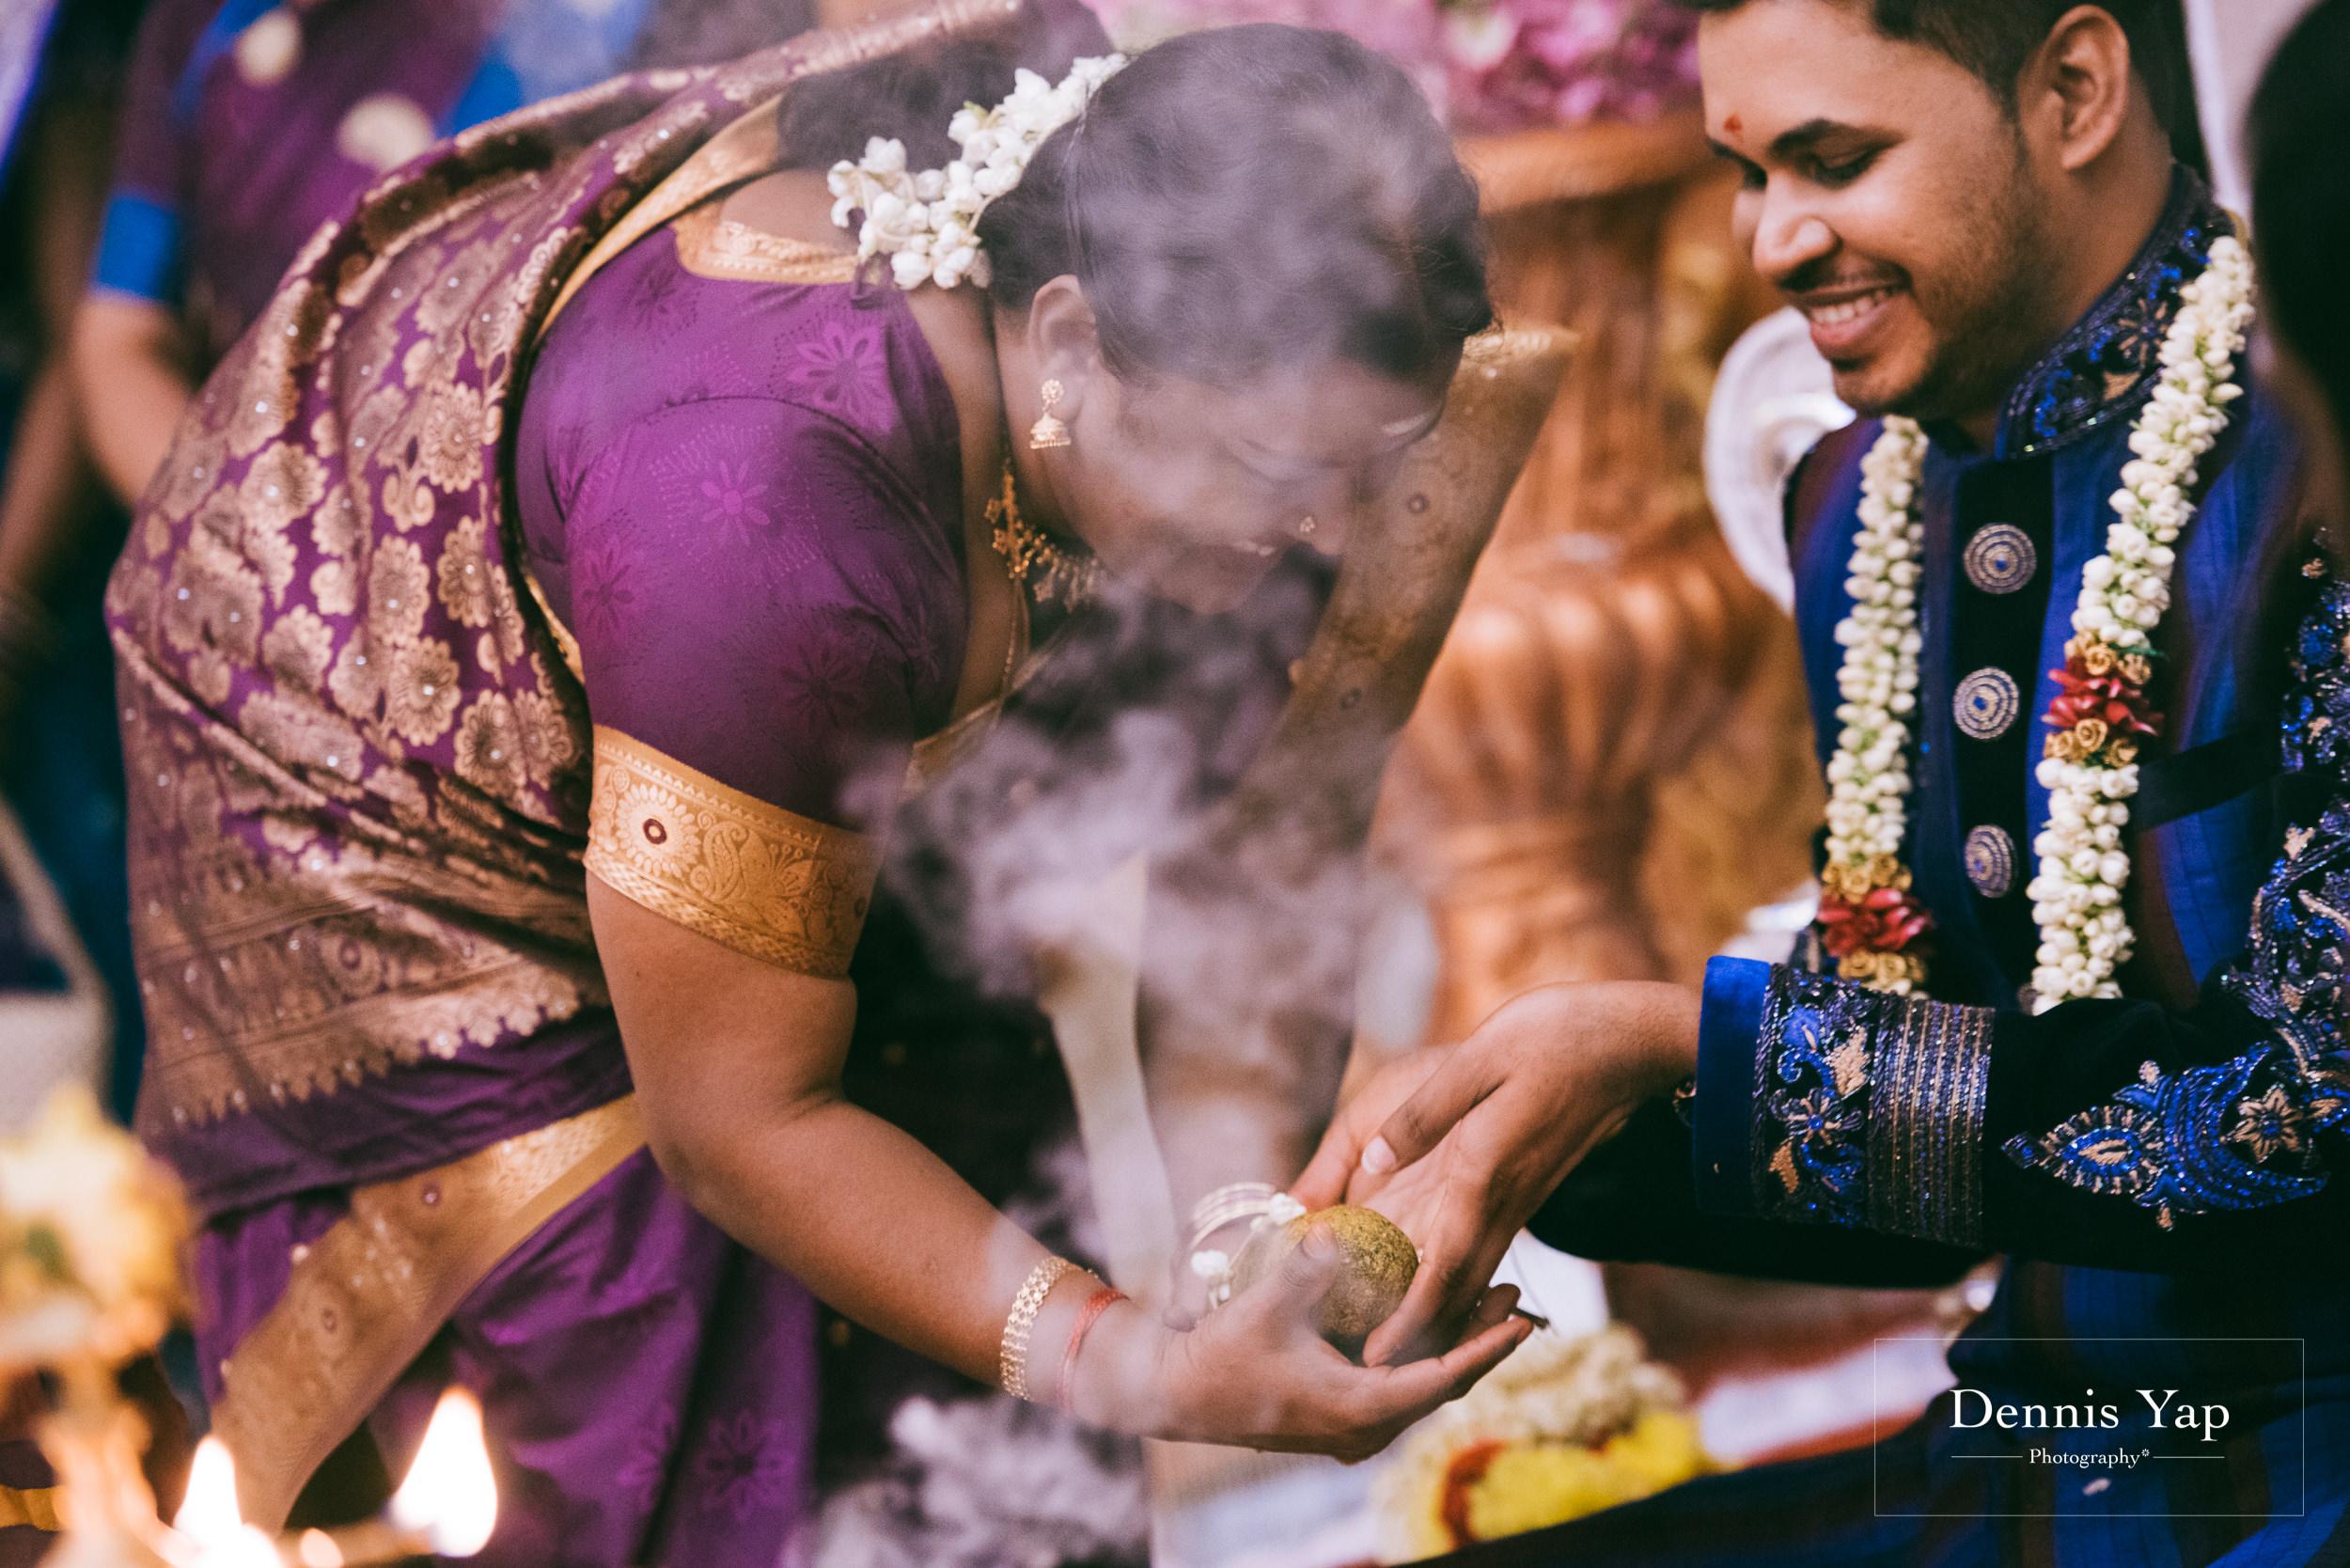 puvaneswaran cangitaa indian wedding ceremony ideal convention dennis yap photography malaysia-17.jpg